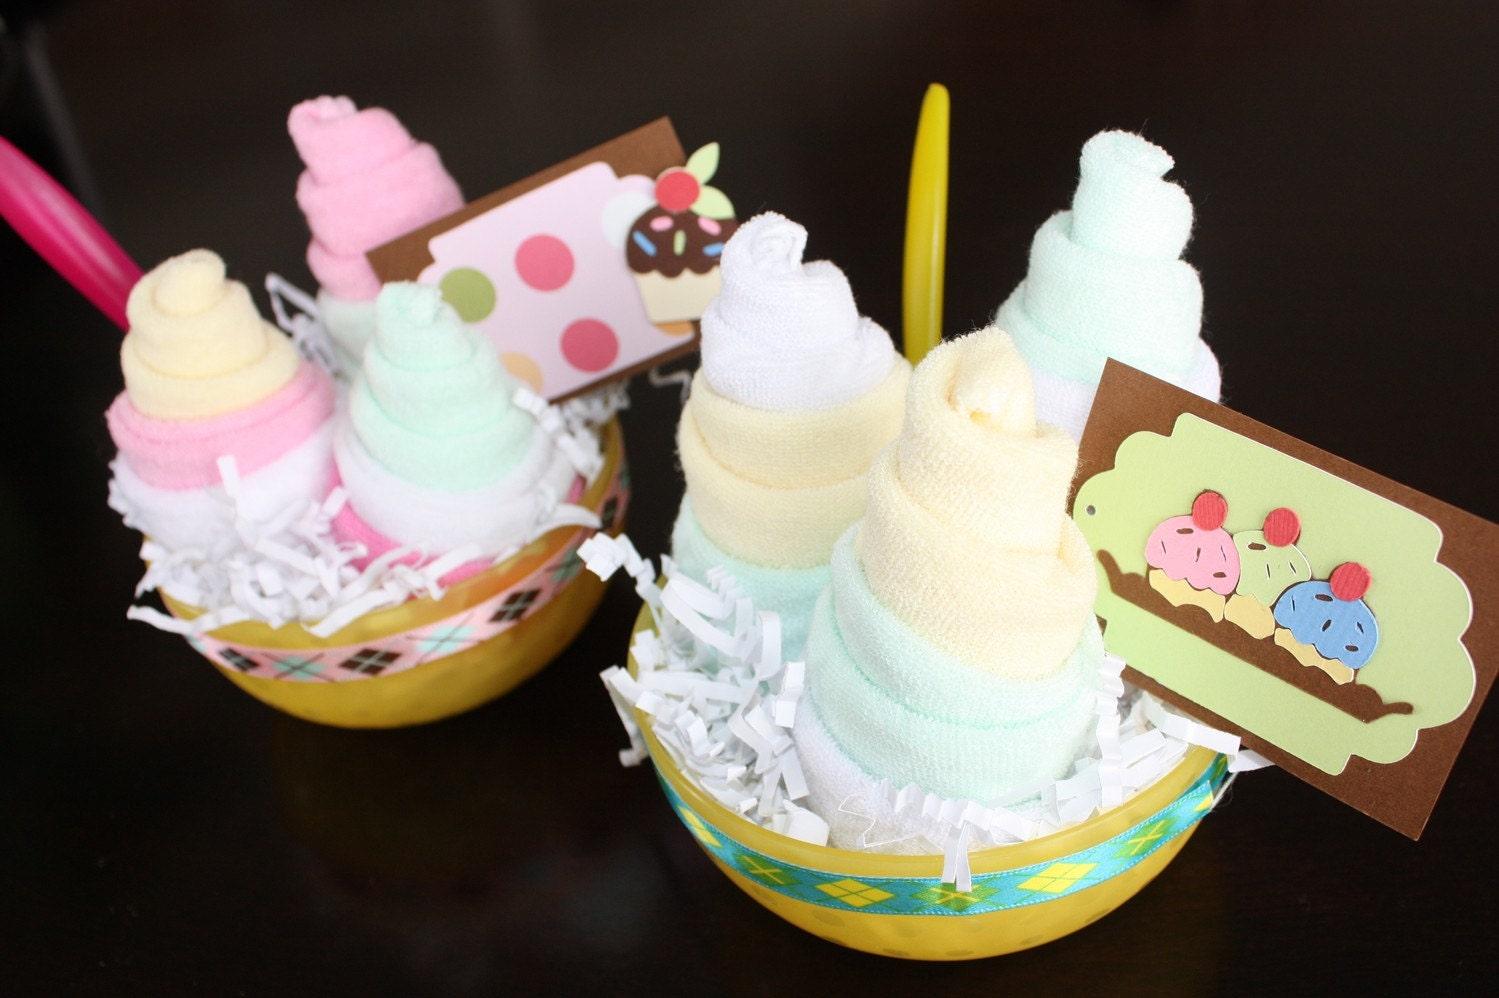 Lemon Melon Ice Cream Sundae - filled with baby items